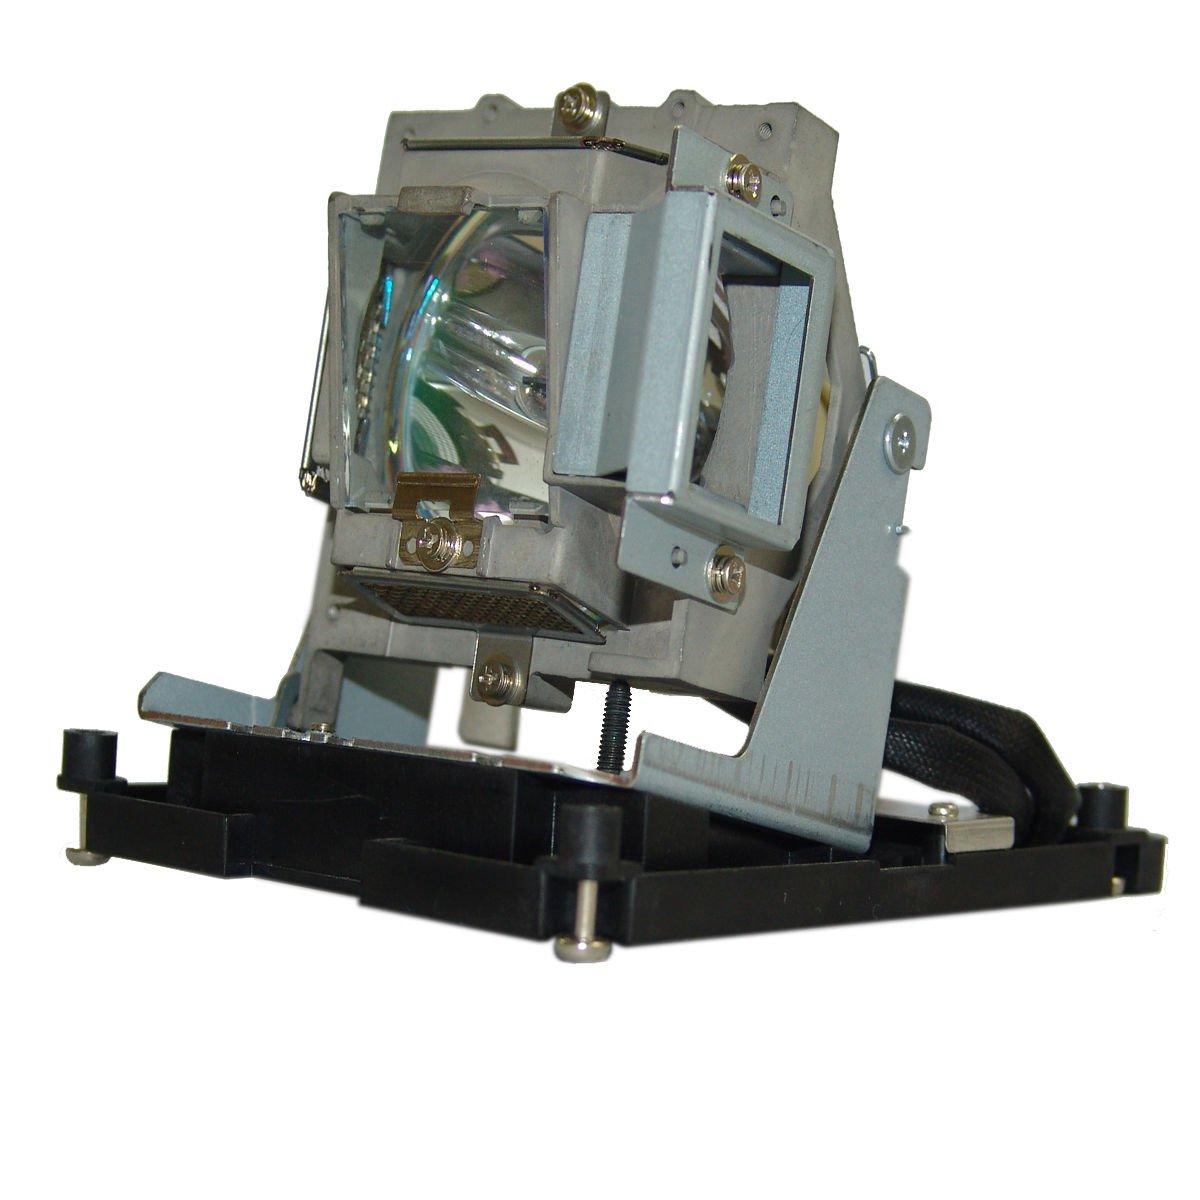 Rich Lighting プロジェクター 交換用 ランプ KG-LA002 TAXAN プロジェクター KG-PH1002WX, KG-PH1004XS 対応【180日保証】   B076WKDC8V